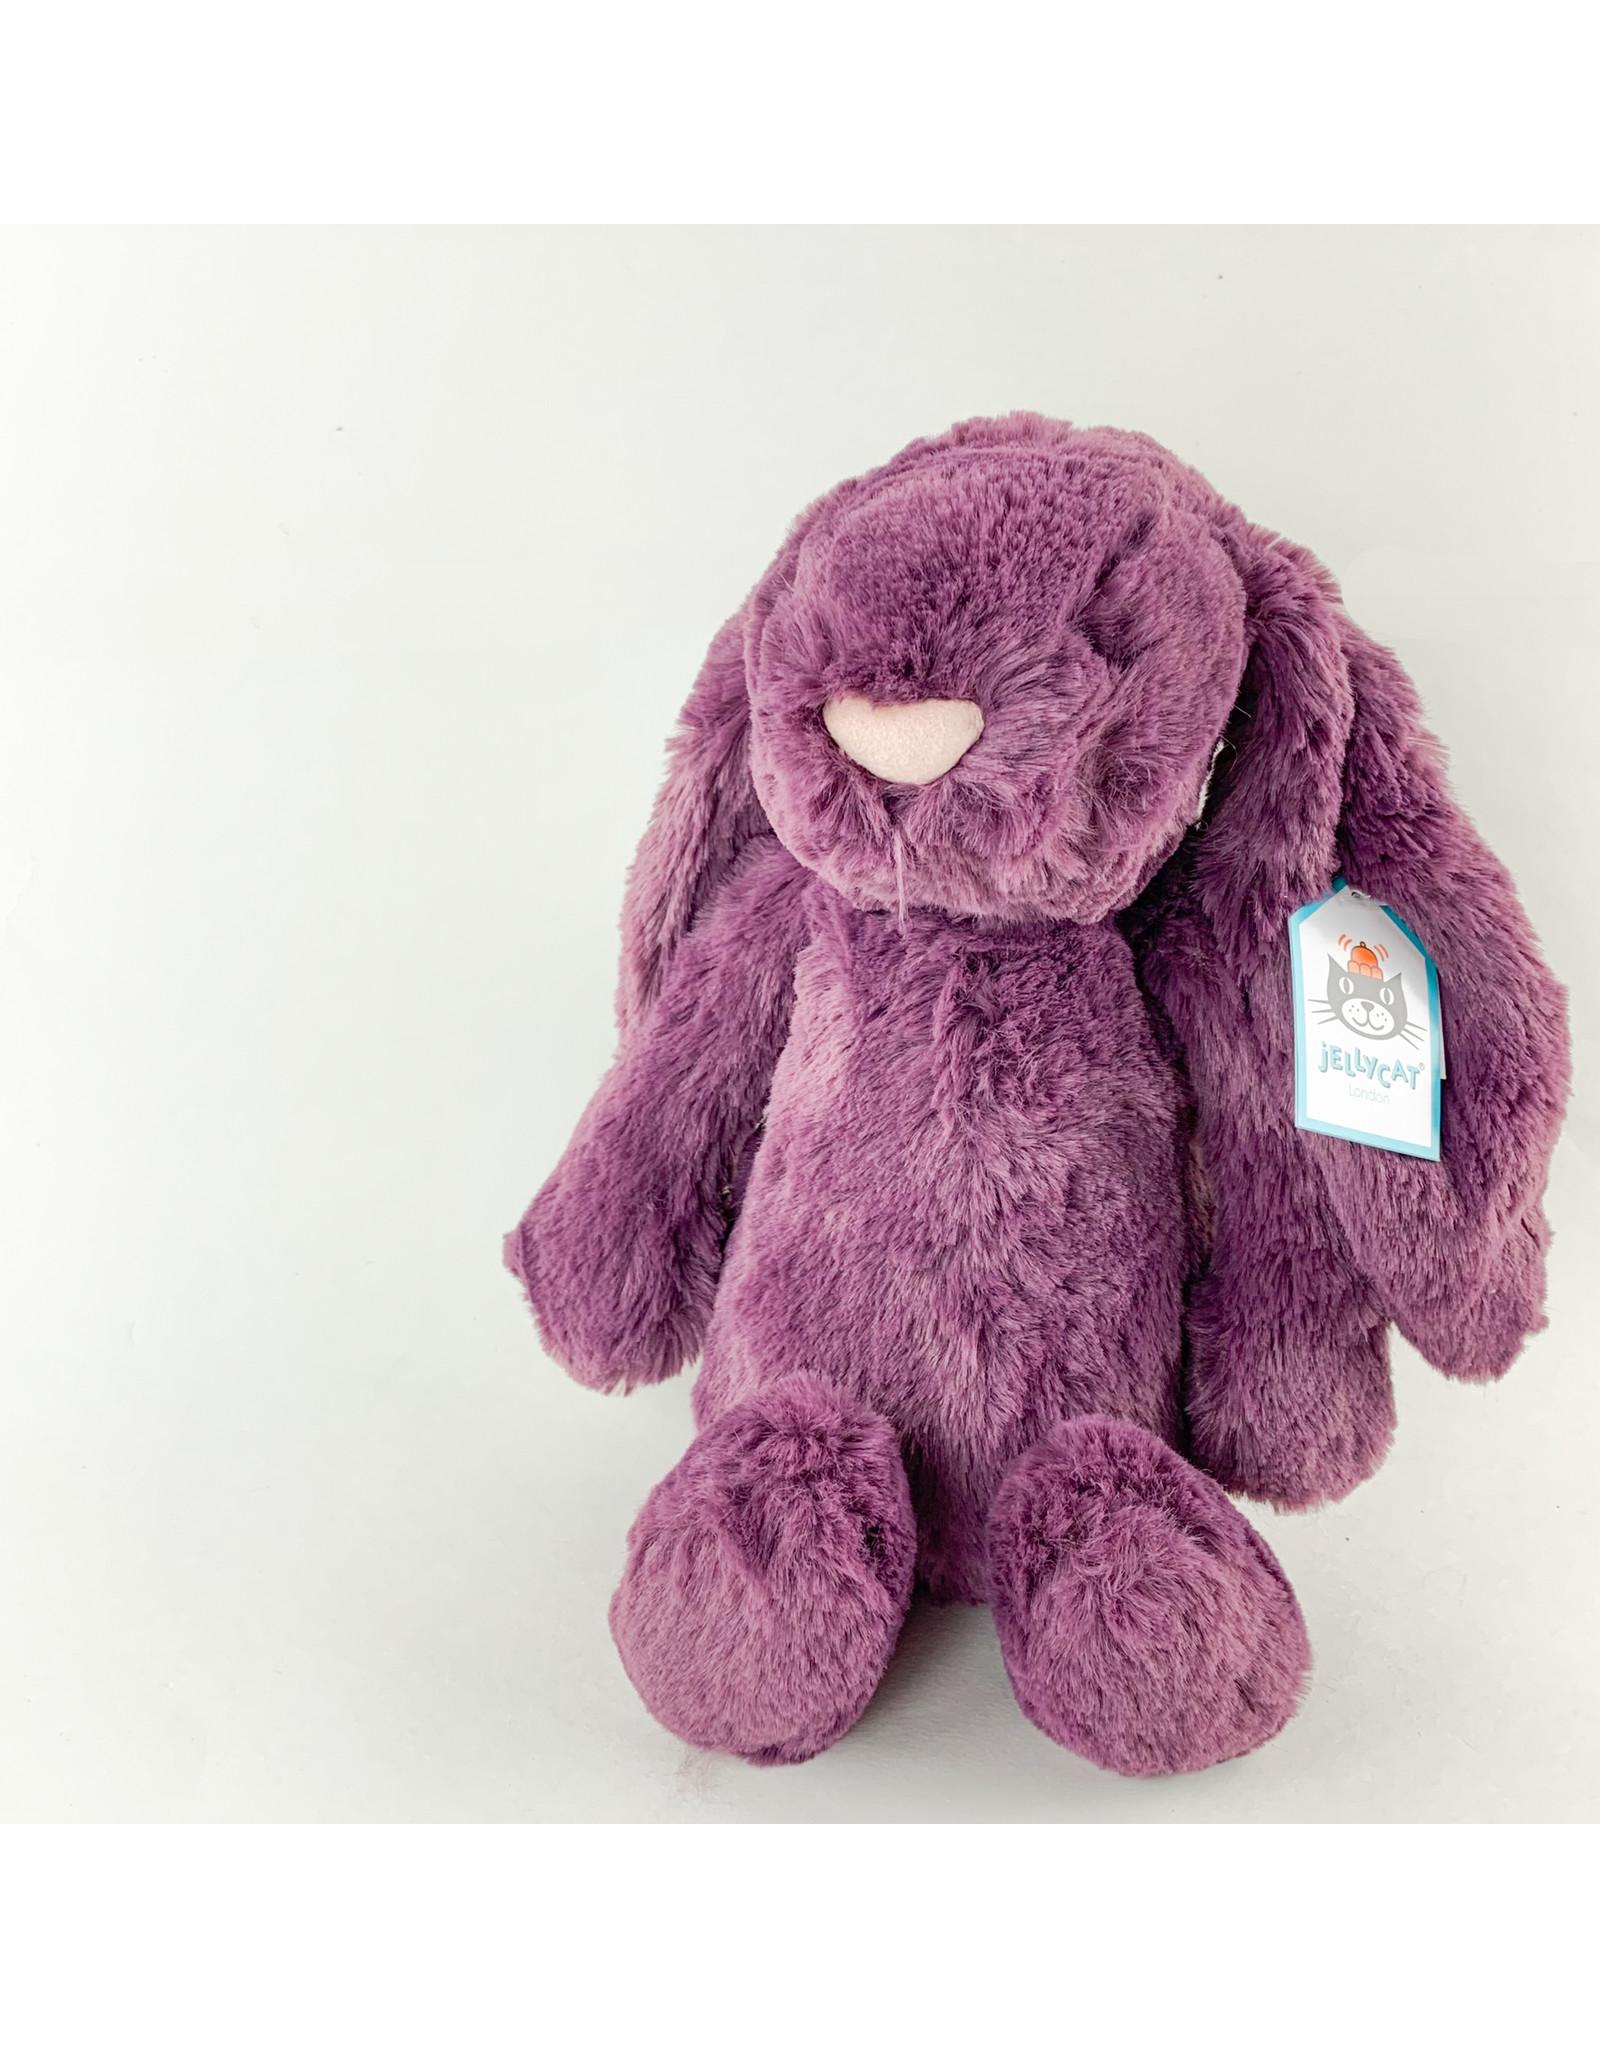 jelly cat Plum bunny